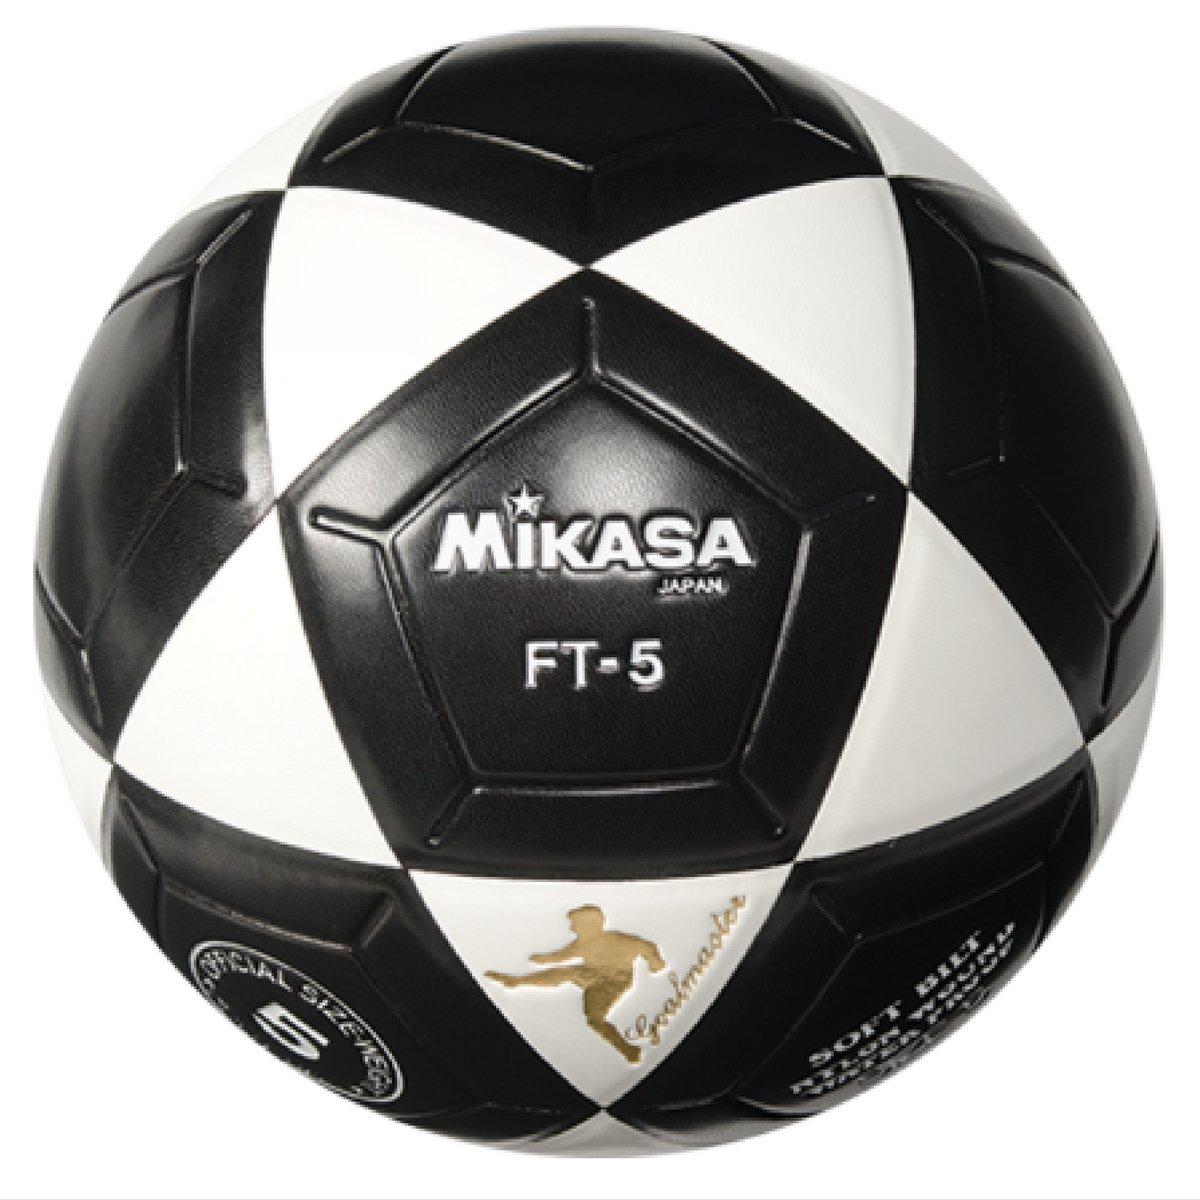 Bola Futevôlei Mikasa FT 5 - Compre Agora  be4b77d4bc6f6